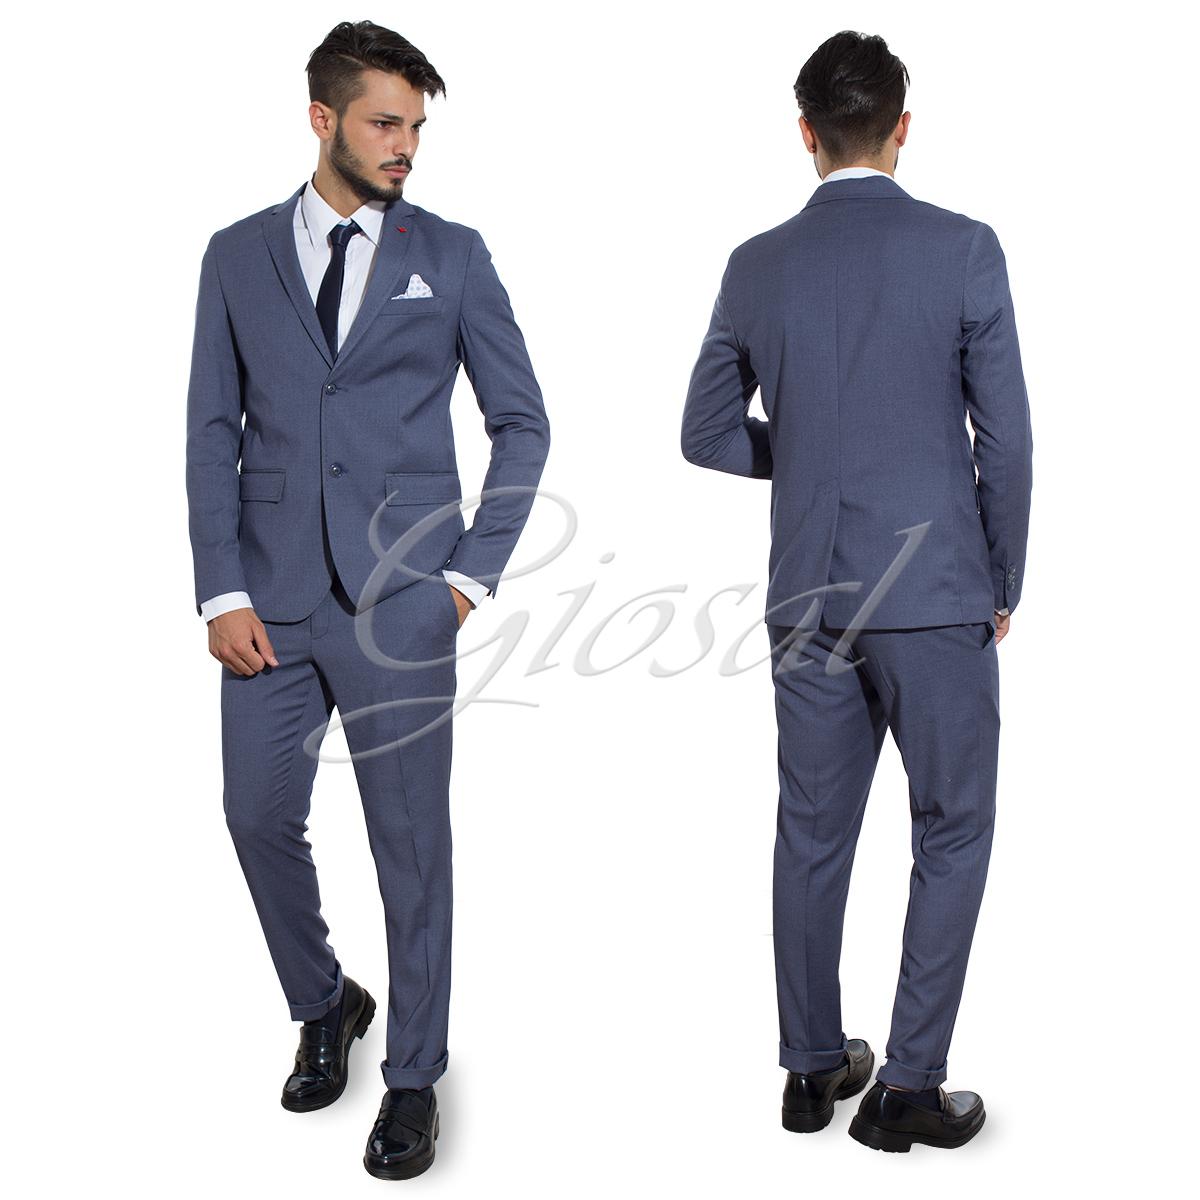 Abito Elegante Uomo Completo Giacca Pantalone Cravattino Bottoni Blu Royal  GI... - AE1009A 6d93b8695b78